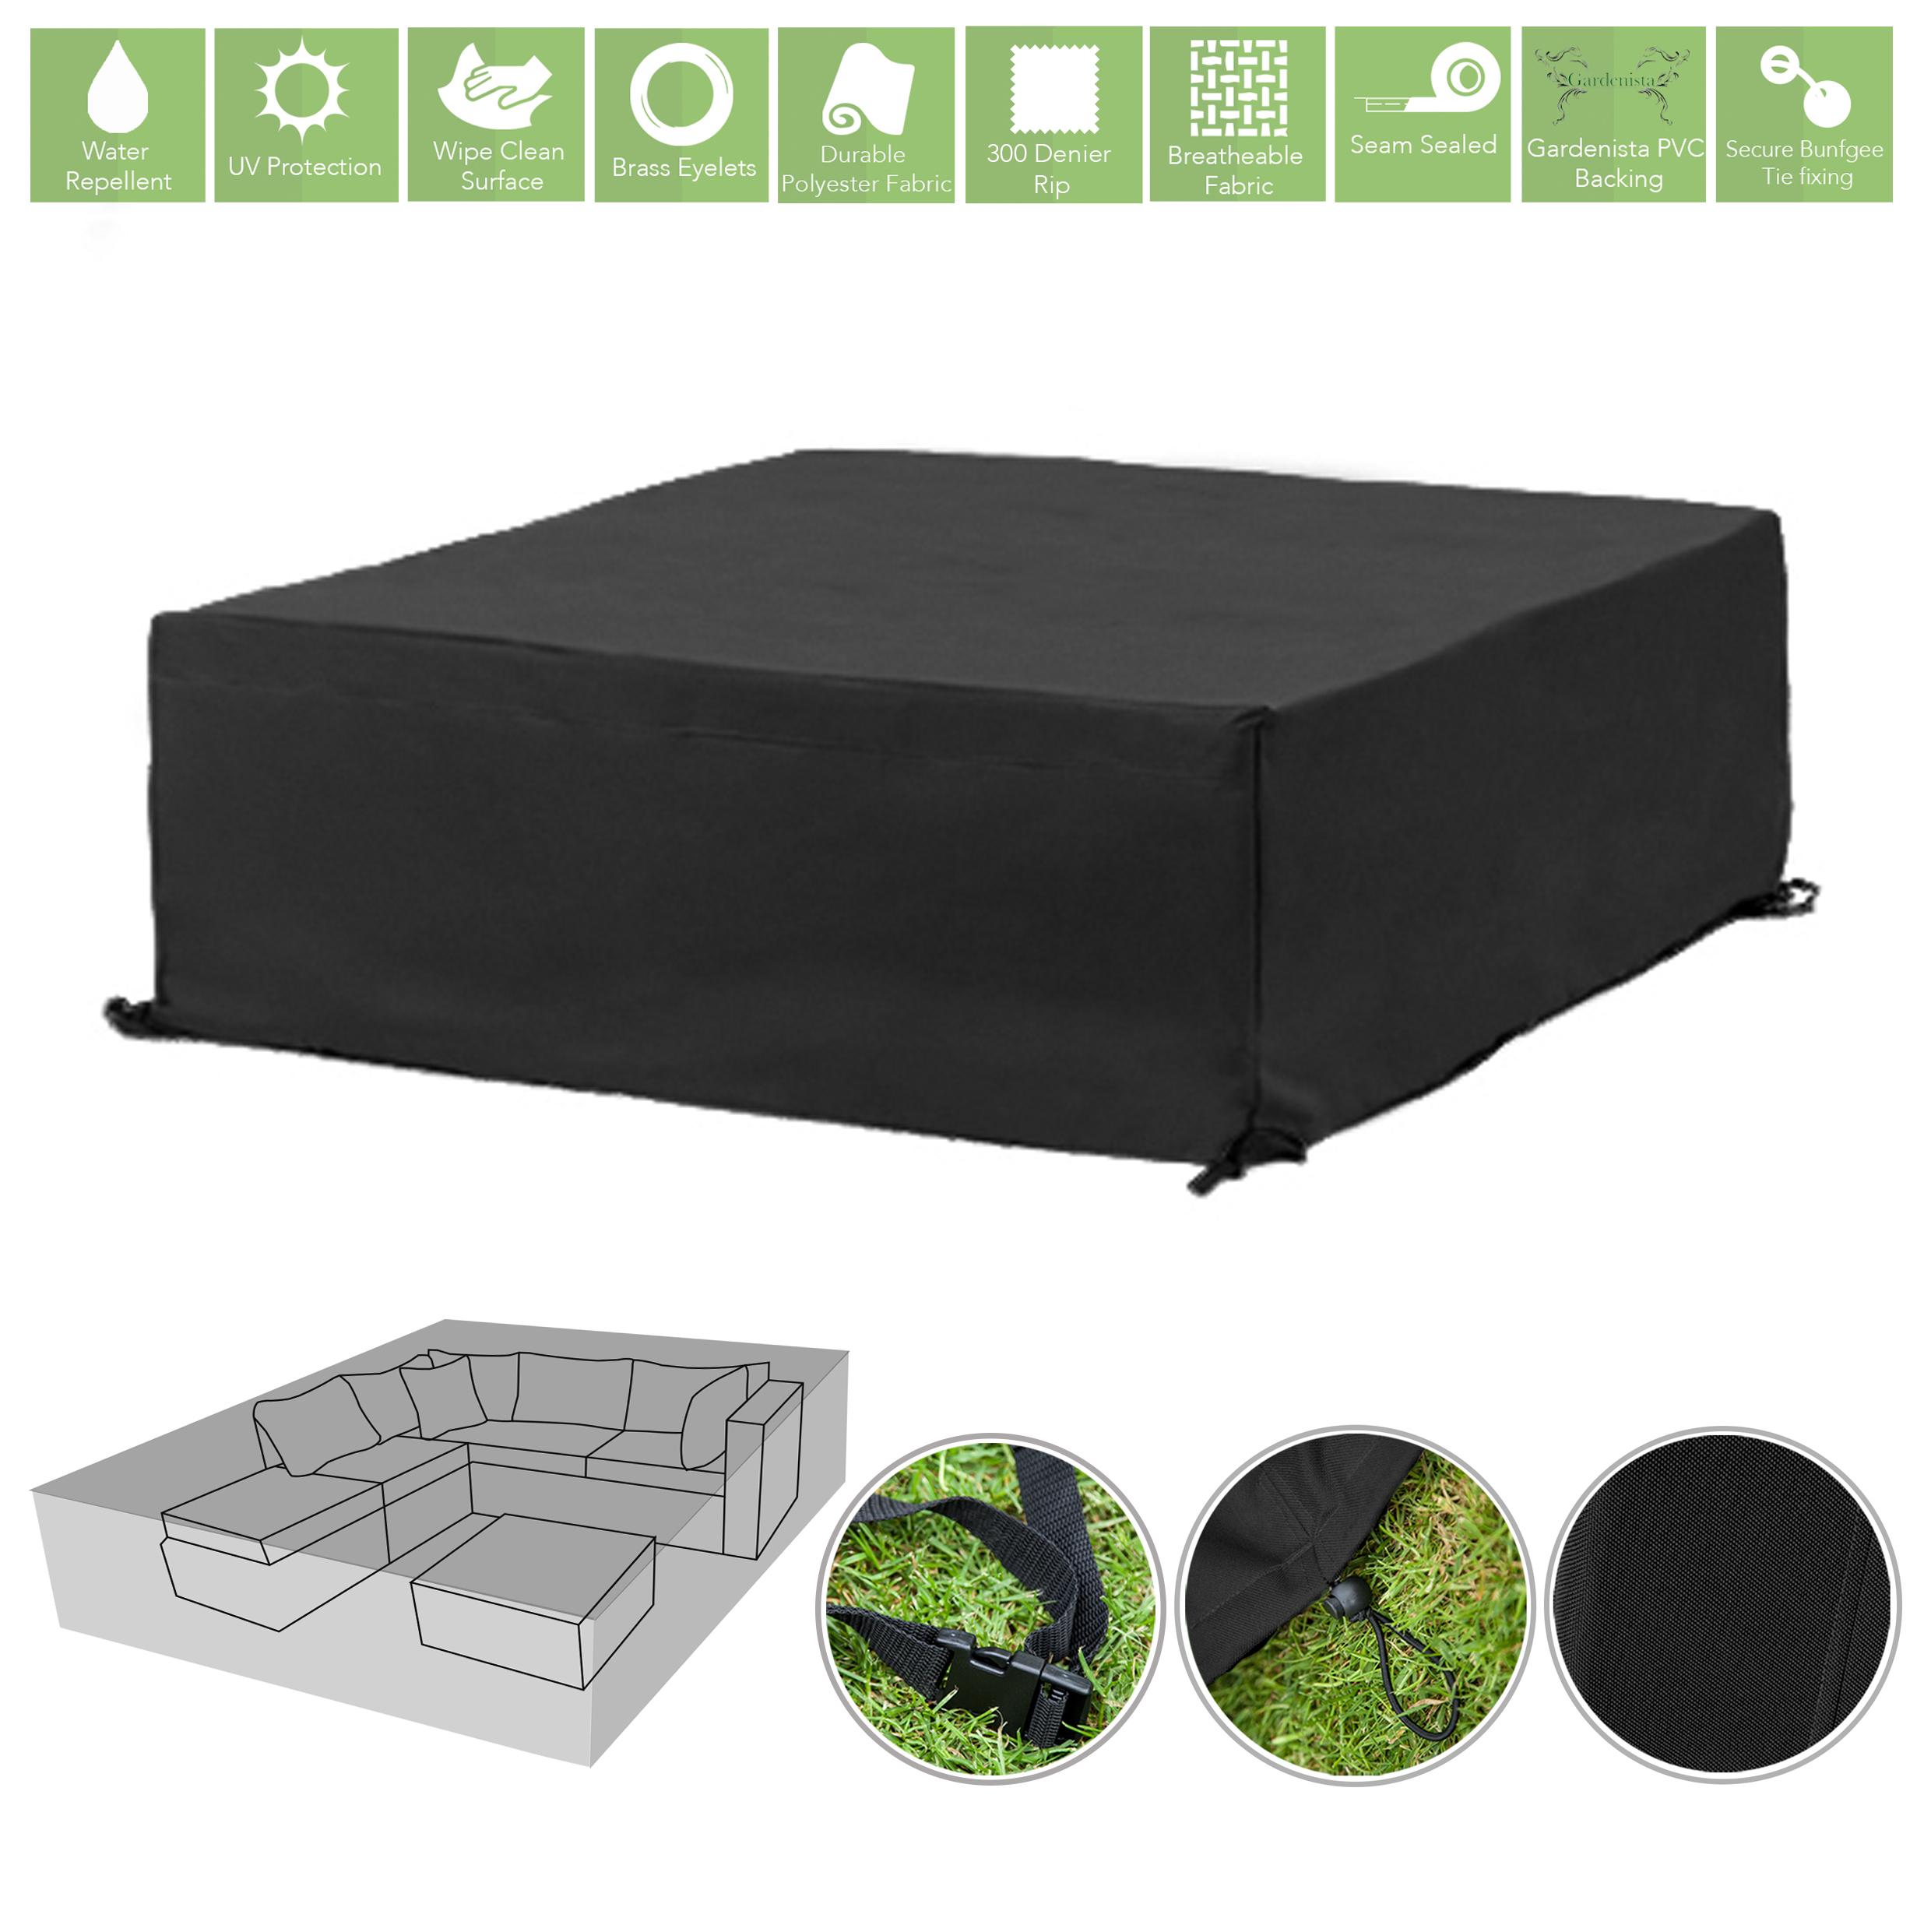 black 10 seater cube outdoor waterproof garden patio furniture cover rh ebay co uk Antique Furniture Antique Furniture